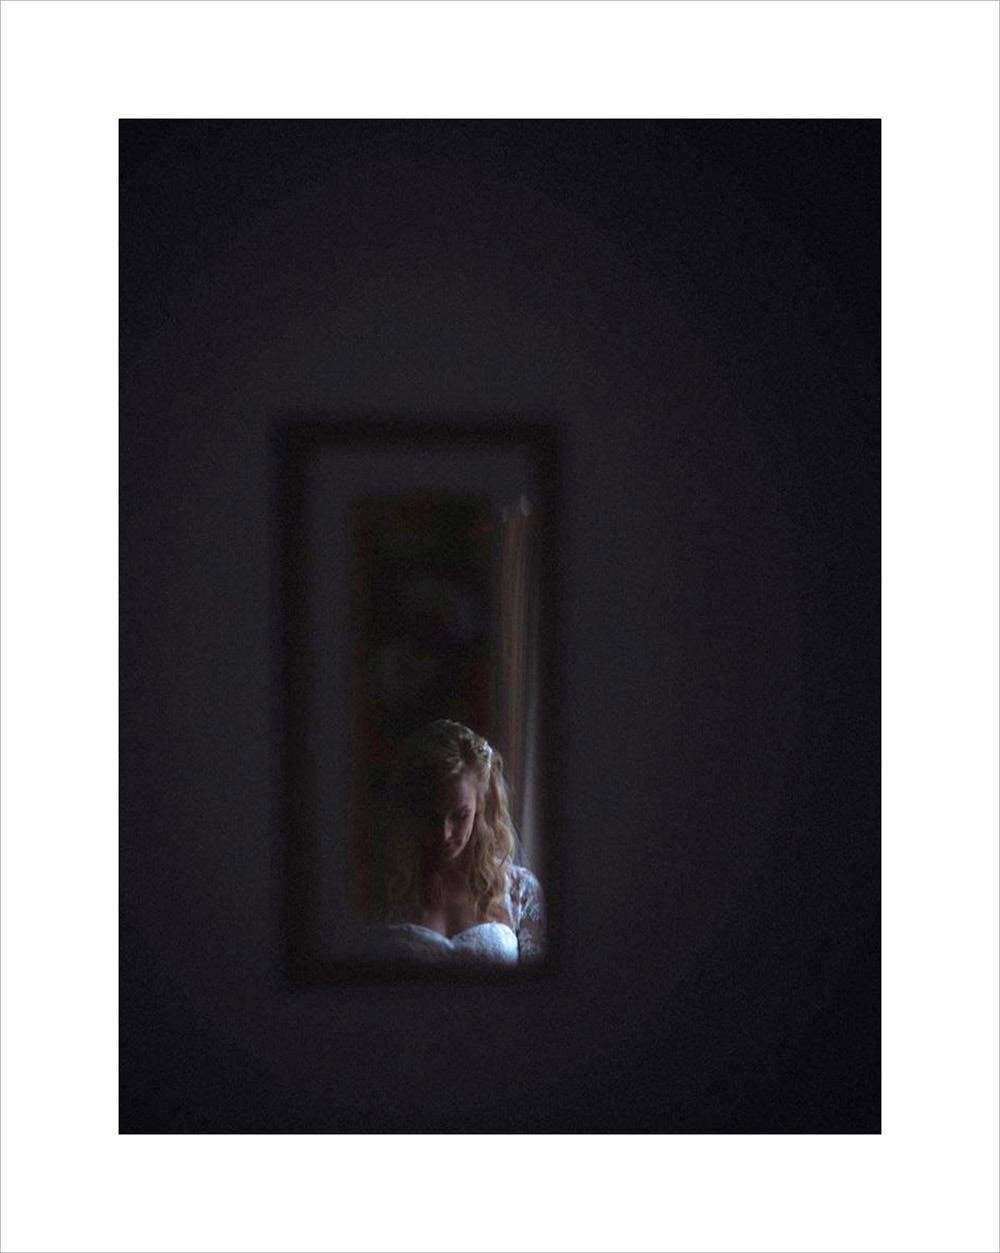 Eric-Yerke-Photography-2013-085.jpg